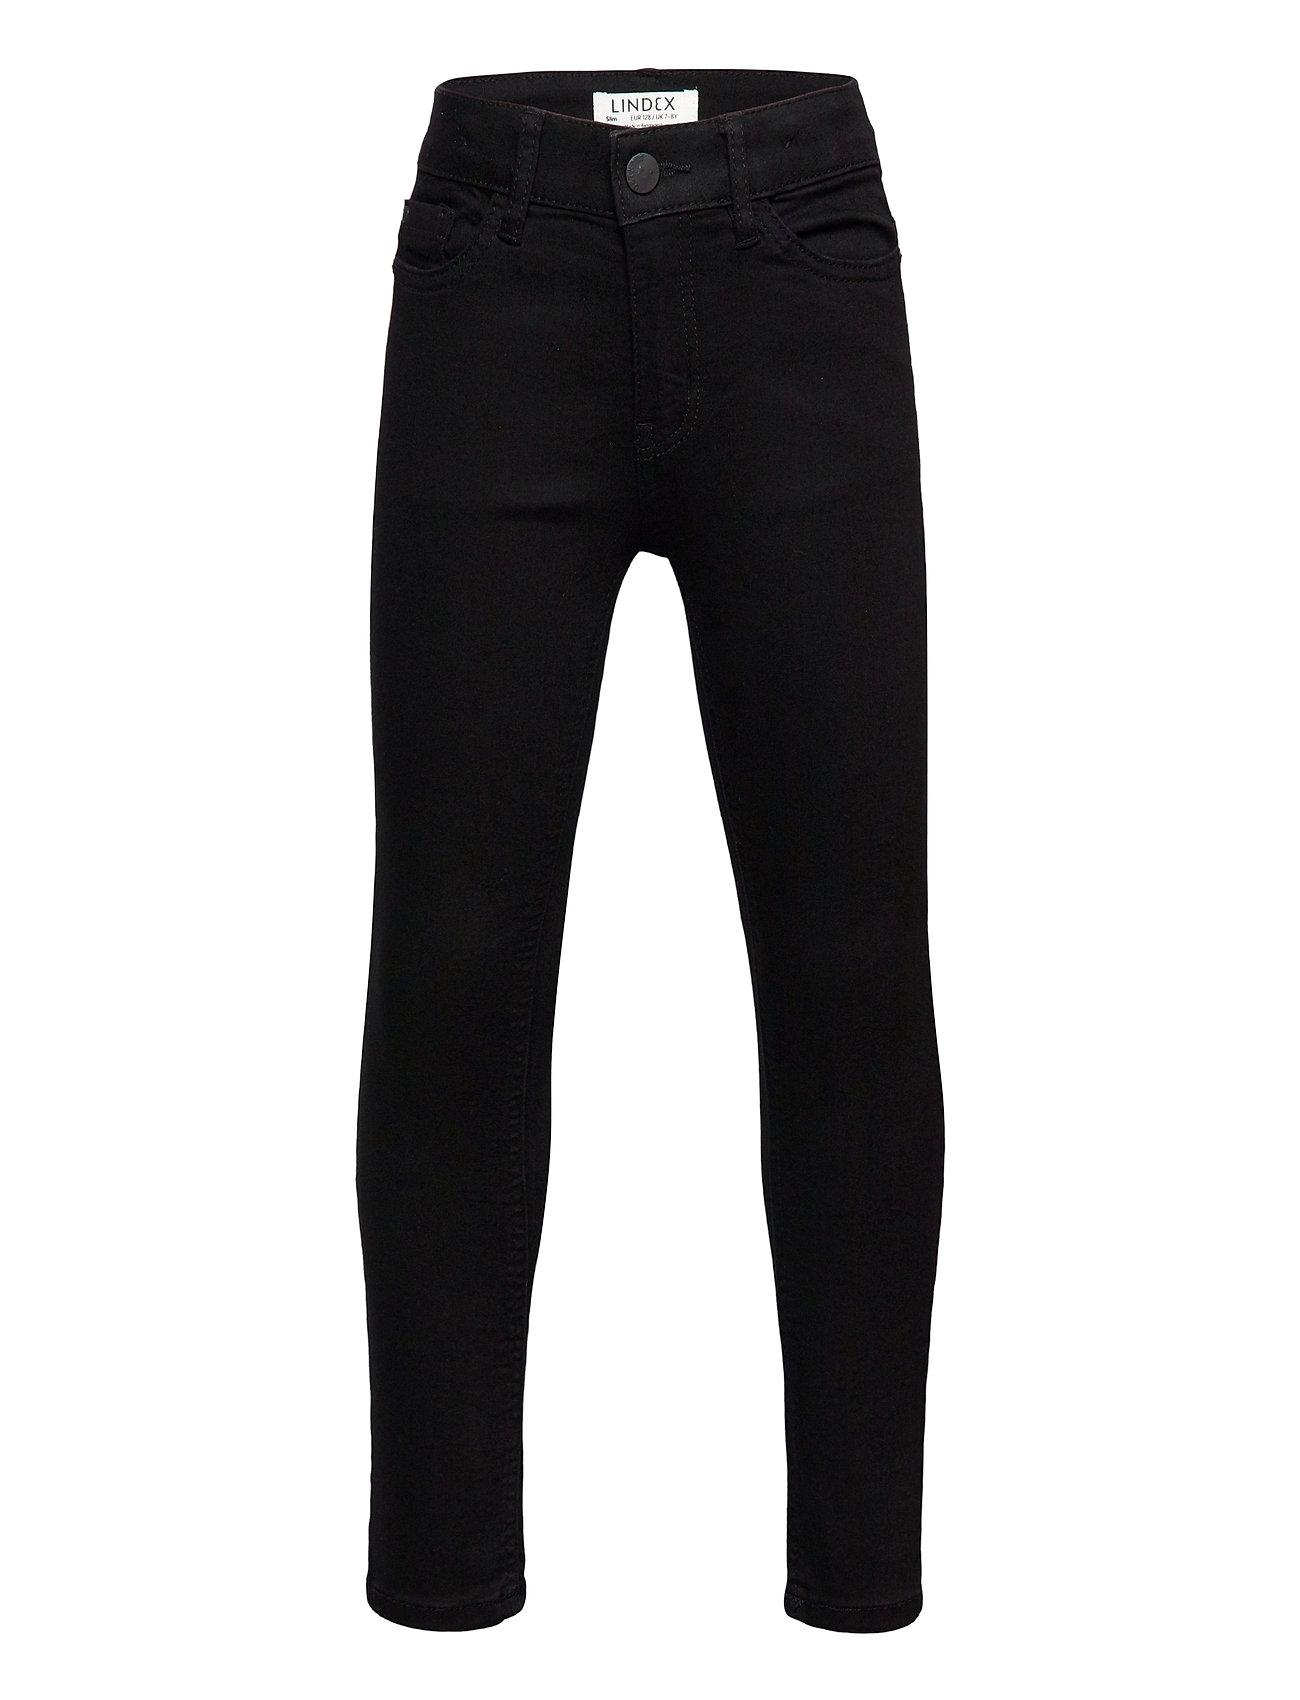 Trousers Denim Selma Black Sli Jeans Sort Lindex